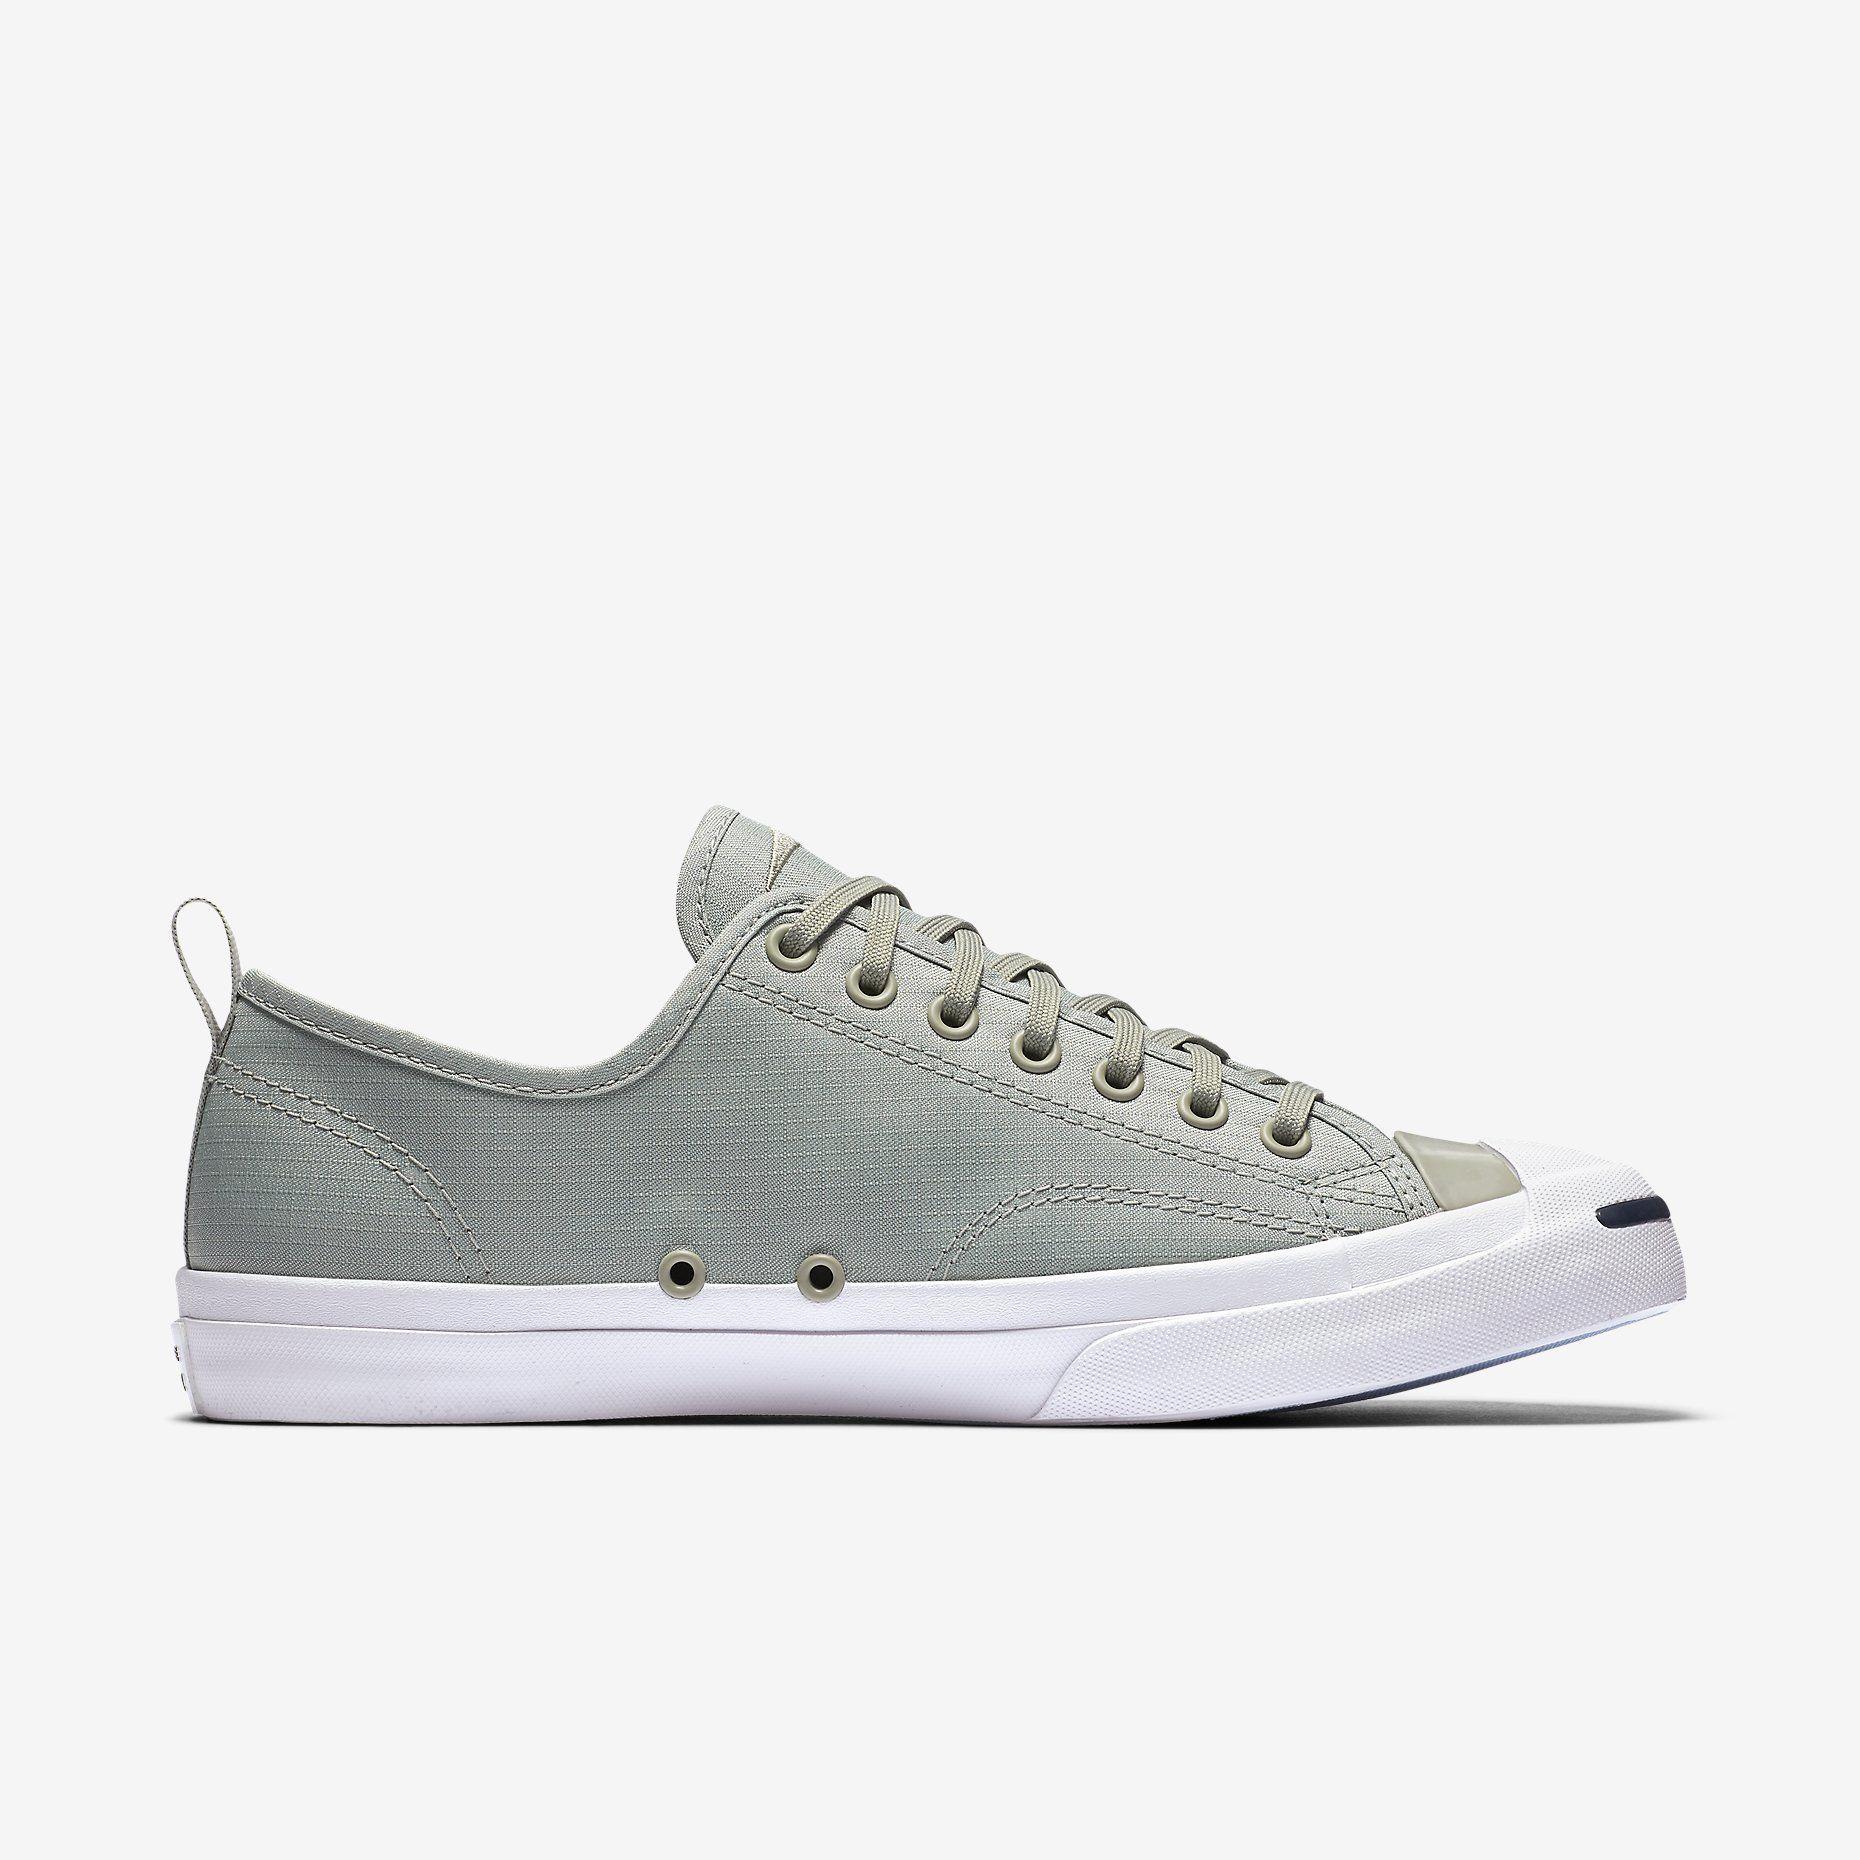 6e94cb92948756 Converse Jack Purcell Micro Rip Low Top Unisex Shoe. Nike.com ...